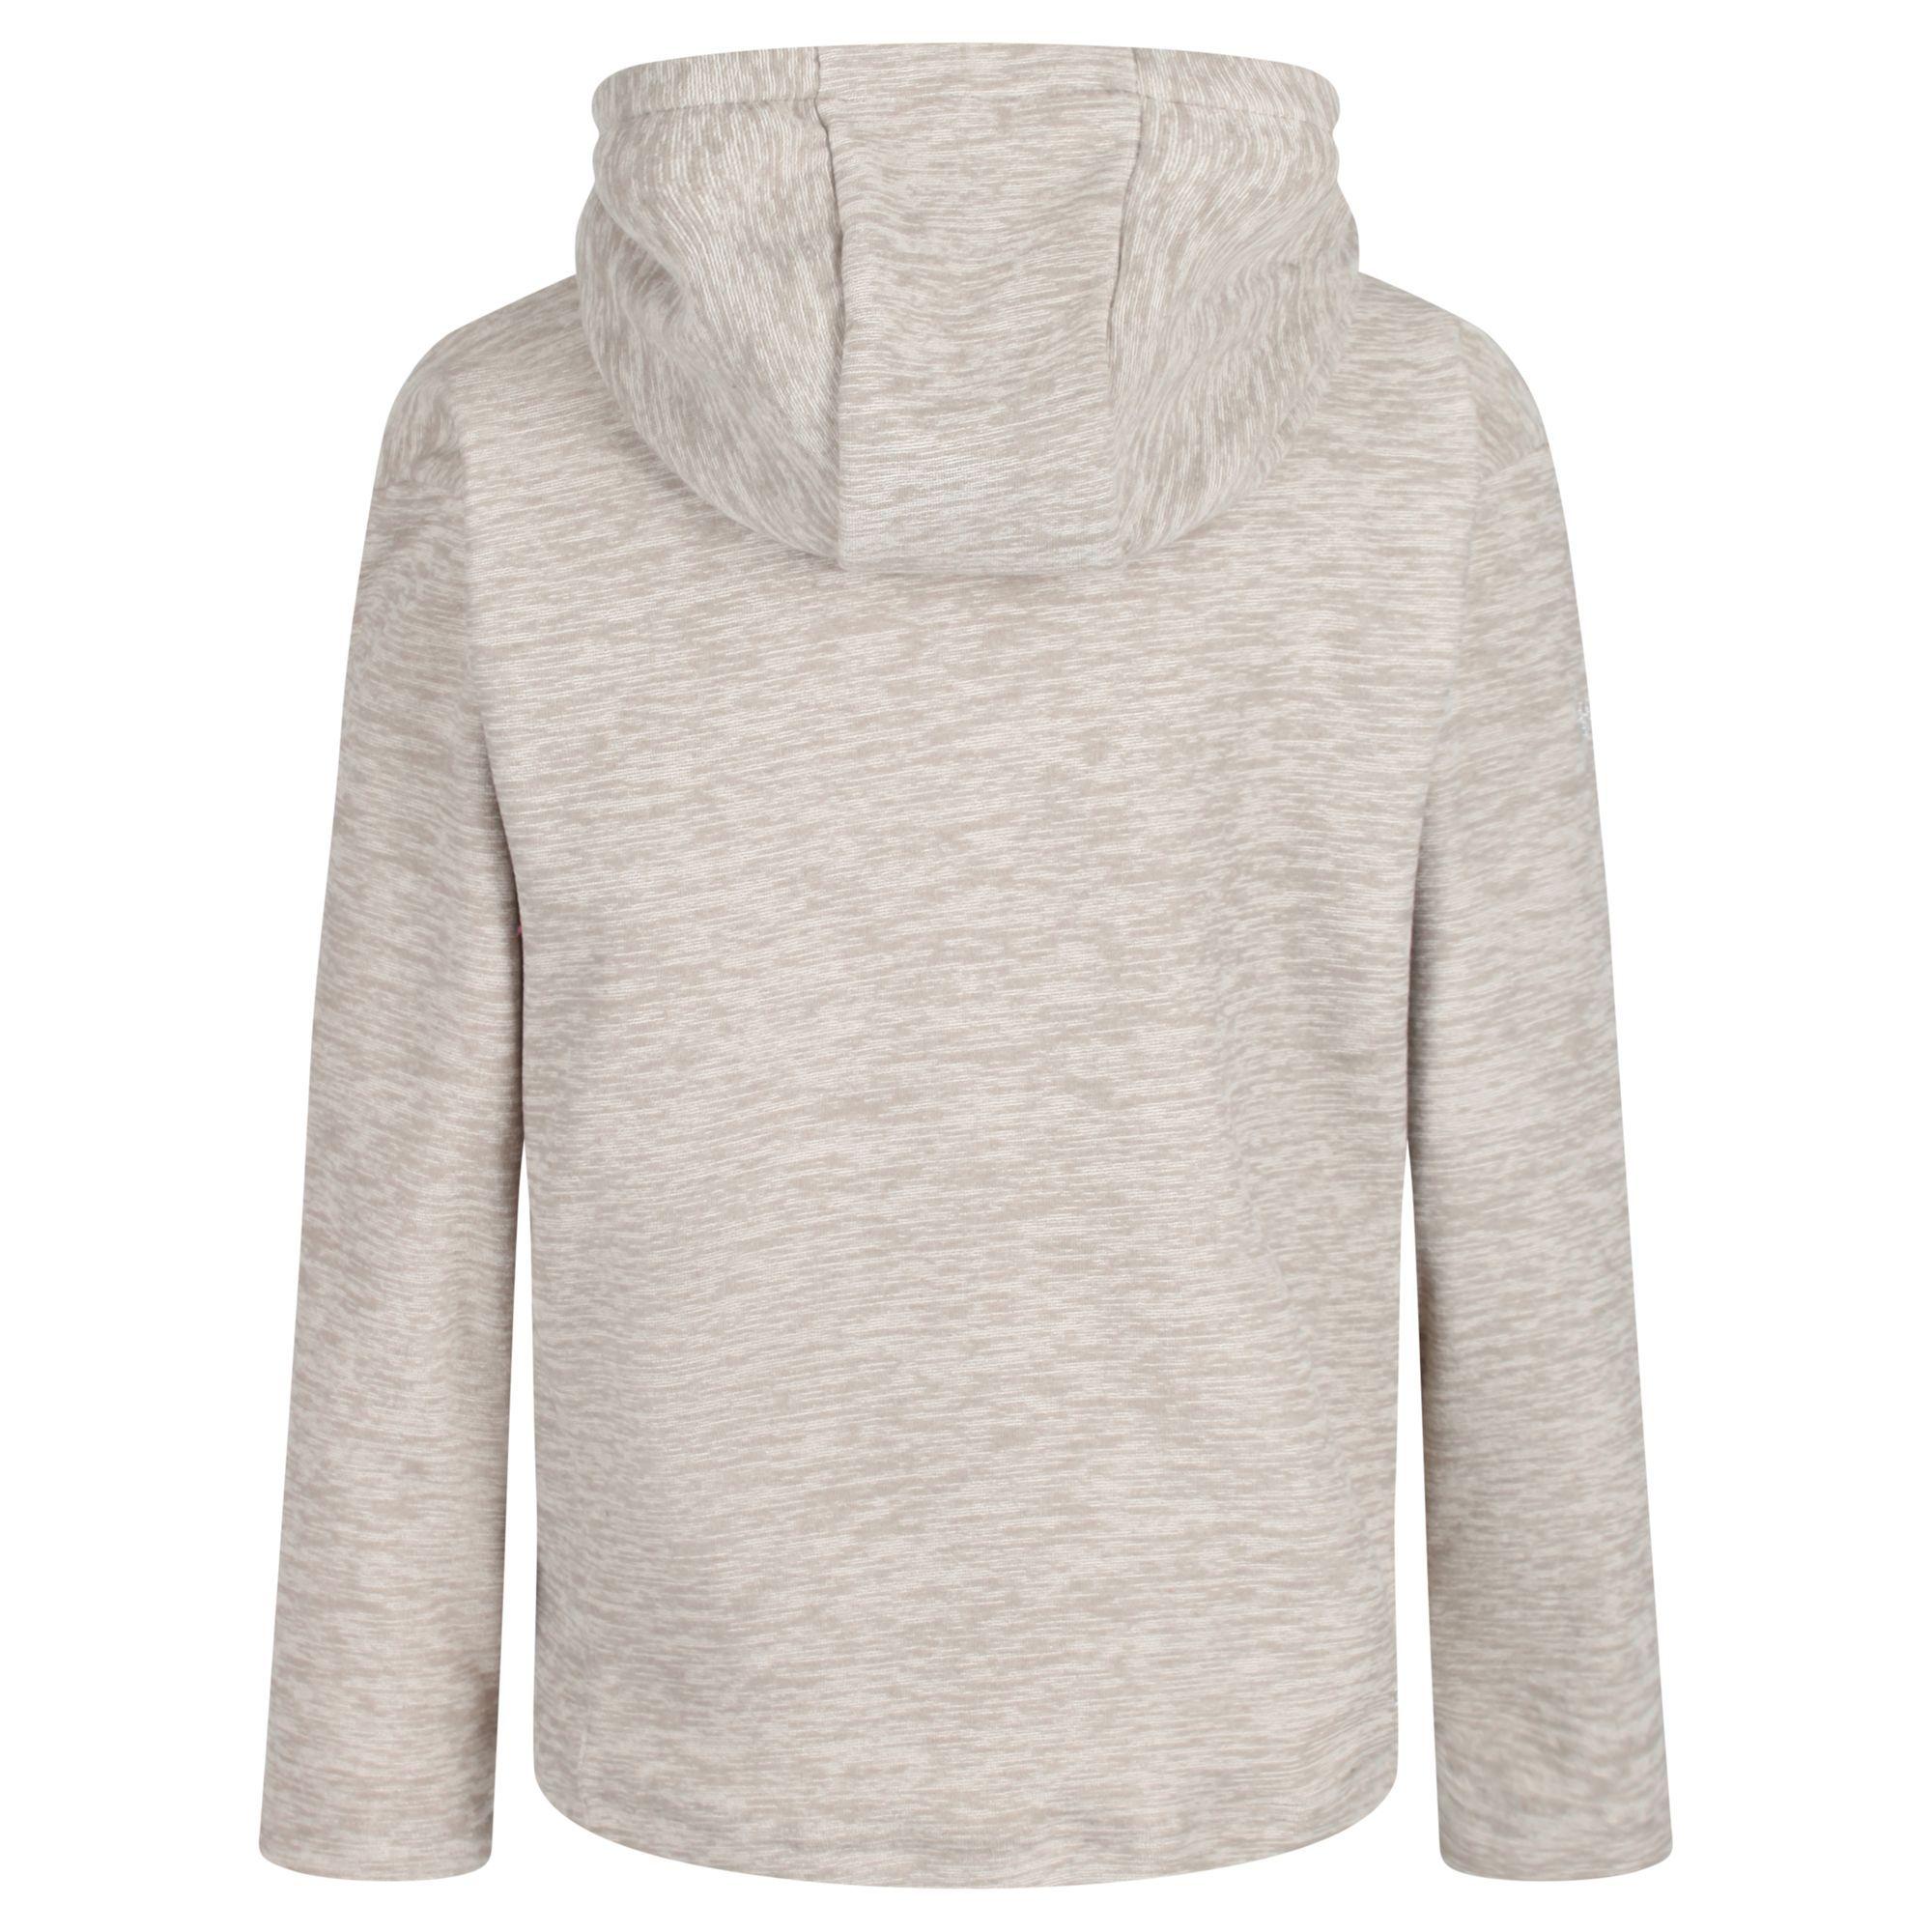 Regatta Childrens/Kids Kacie Hooded Fleece